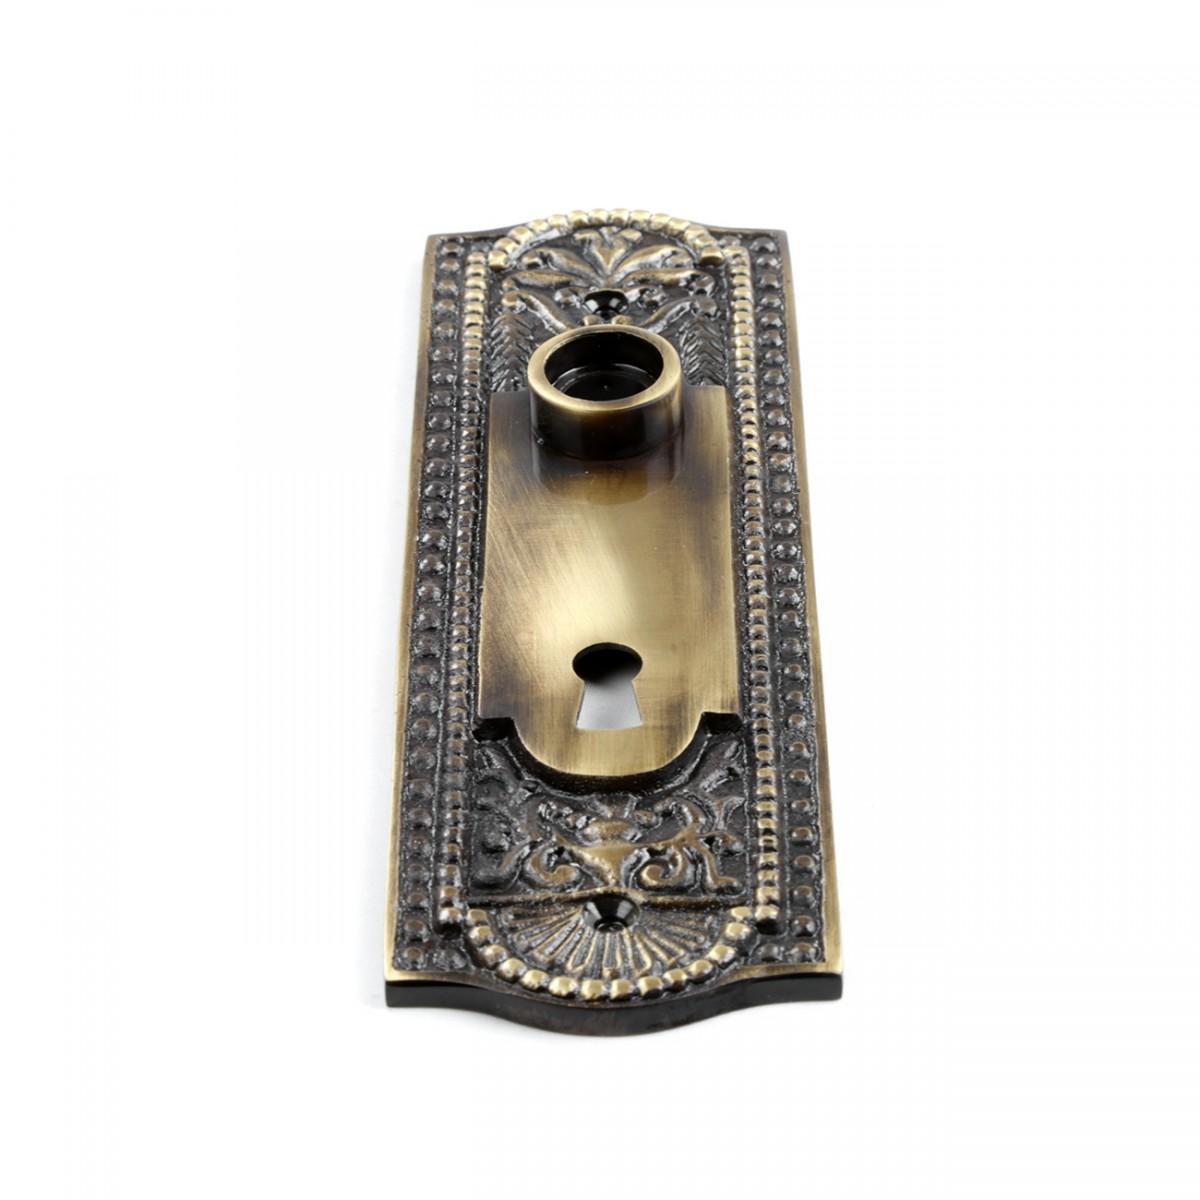 Door Back Plate Antique Brass Beaded With Keyhole 7 14 H Door Plate Door Plates Antique Door Plate